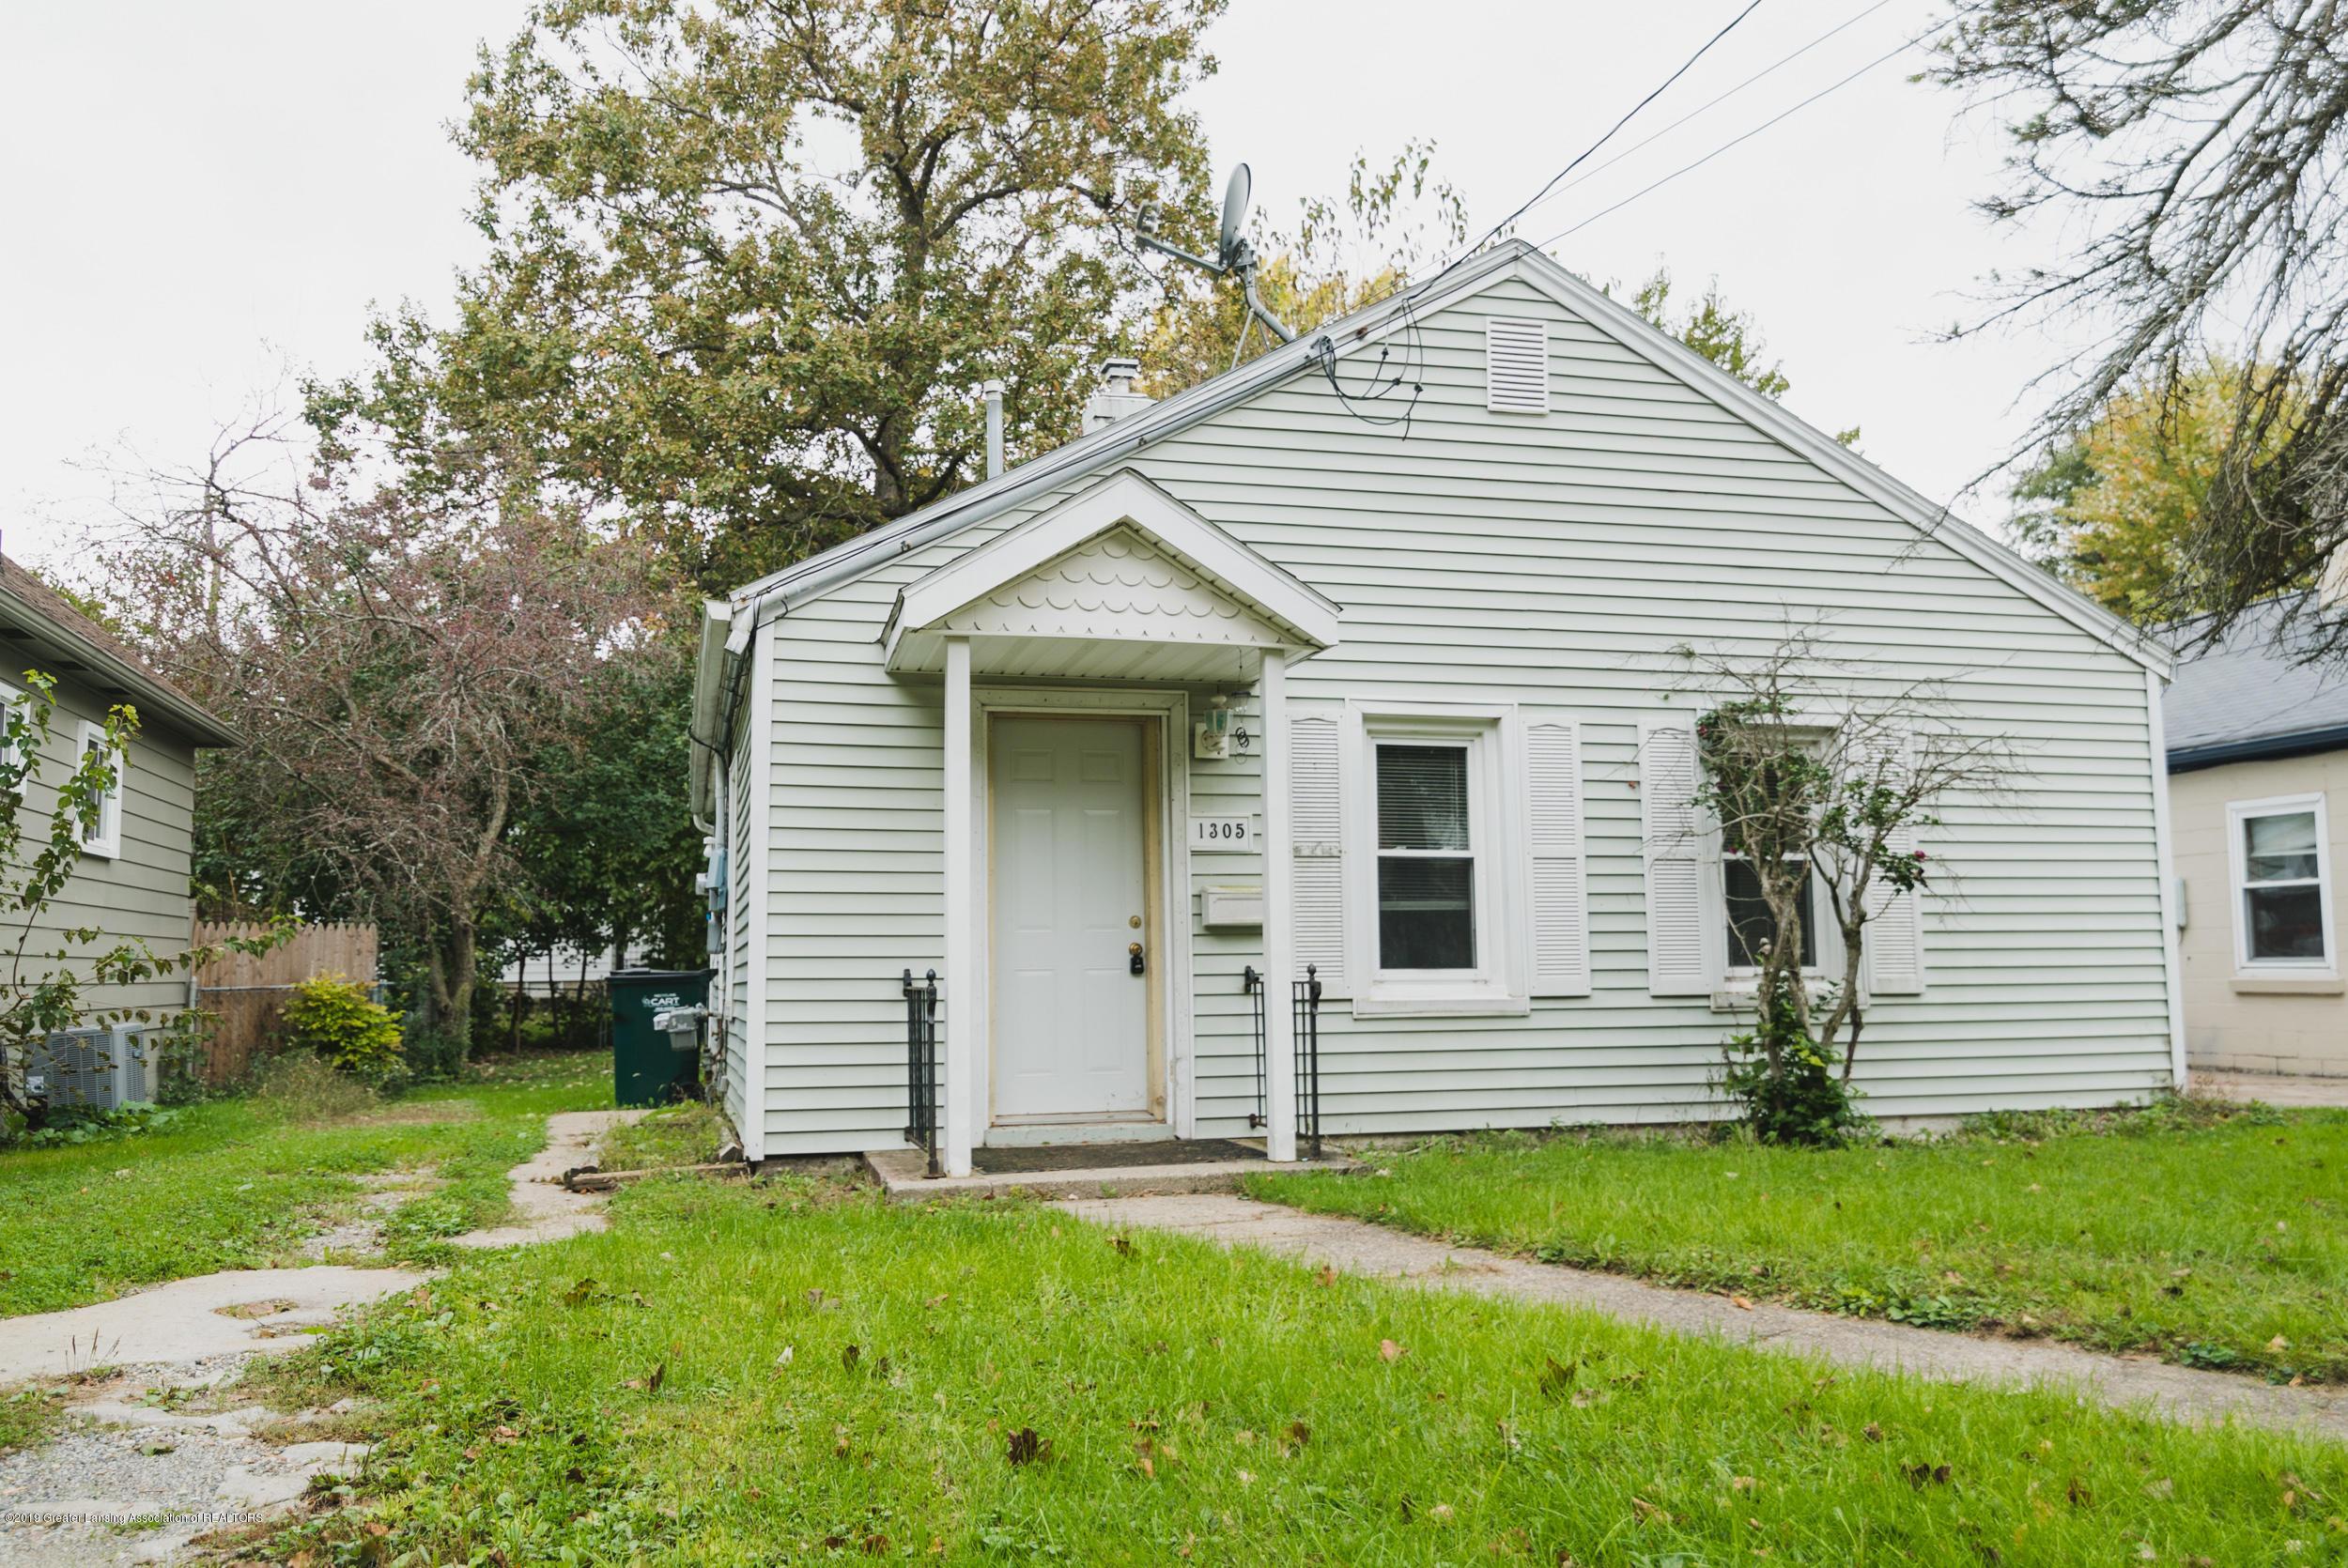 1305 Maryland Ave - DSC01762 - 1